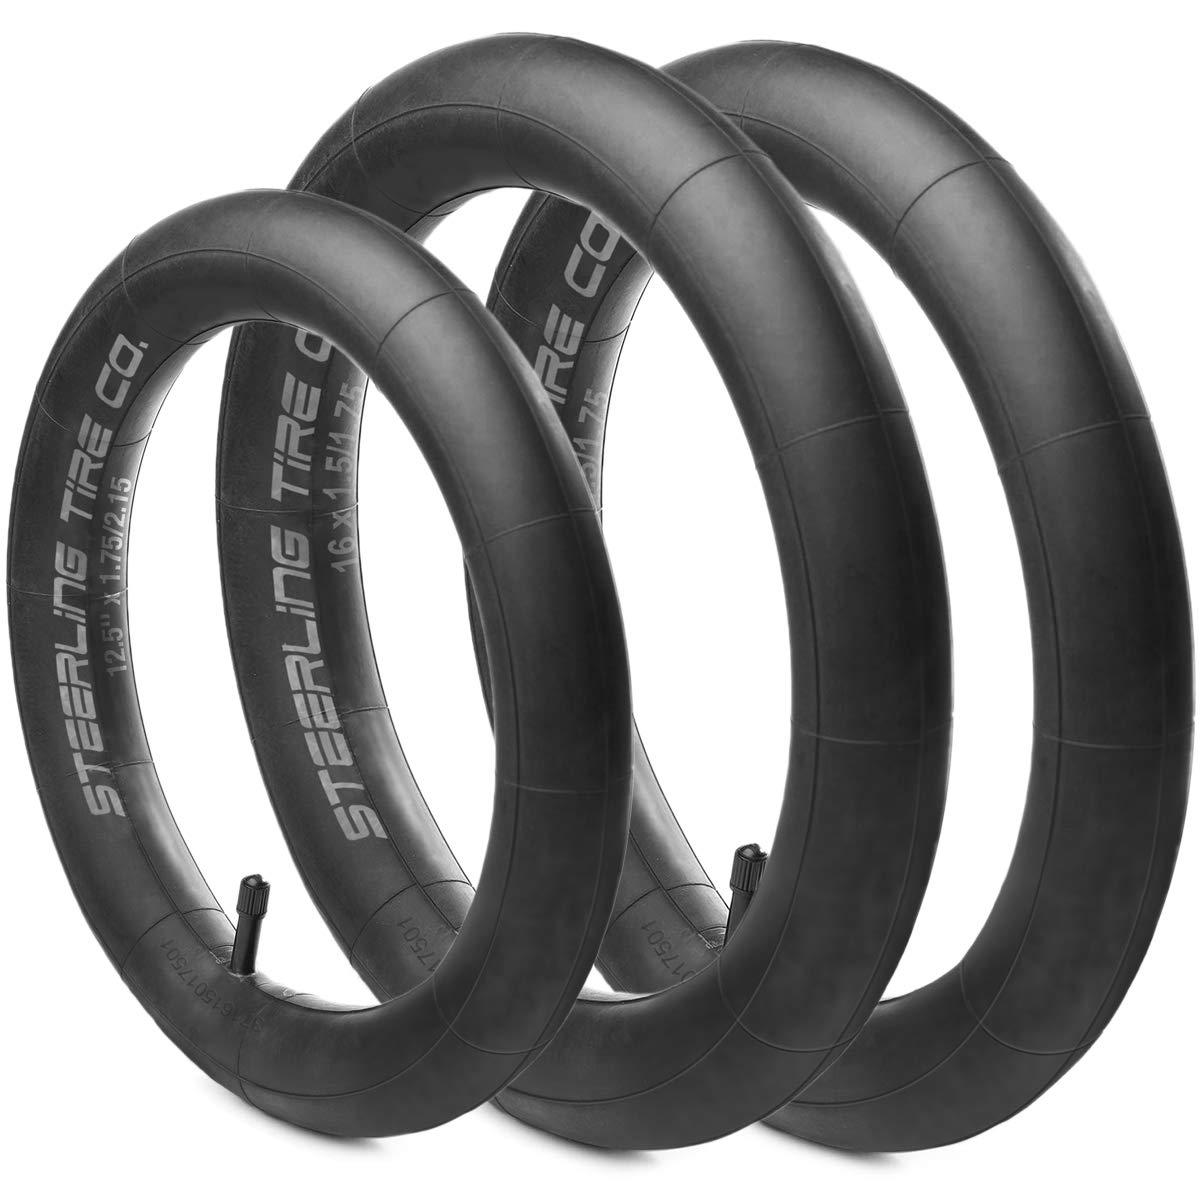 Two 16'' x 1.5/1.75 R & One 12.5'' x 1.75/2.15 F Heavy Duty Thorn Resistant Inner Tire Tube for BOB Revolution Strollers & Stroller Strides - Smart BOB Stroller Tire Set [3 Pack] Steerling Tire Co.